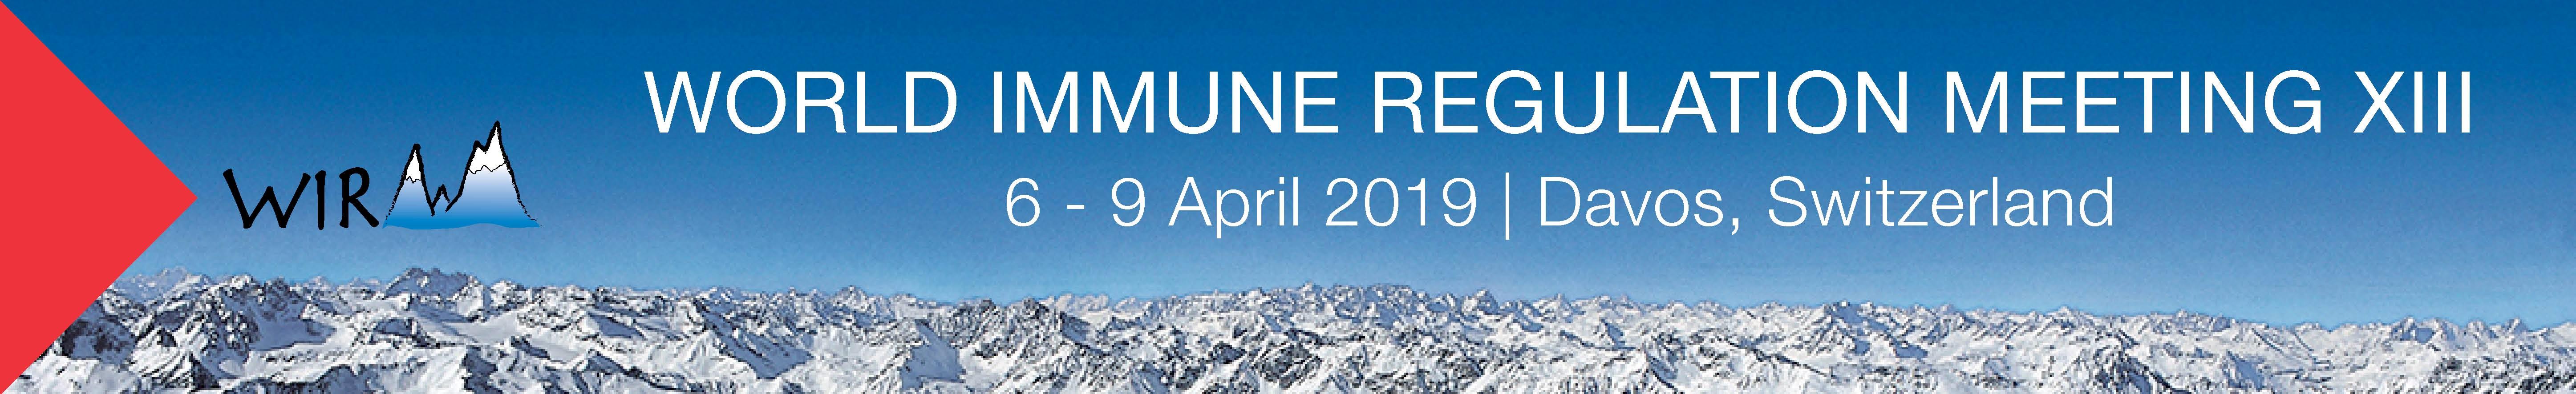 WIRM Meeting Davos 6 - 9 April 2019 Davos